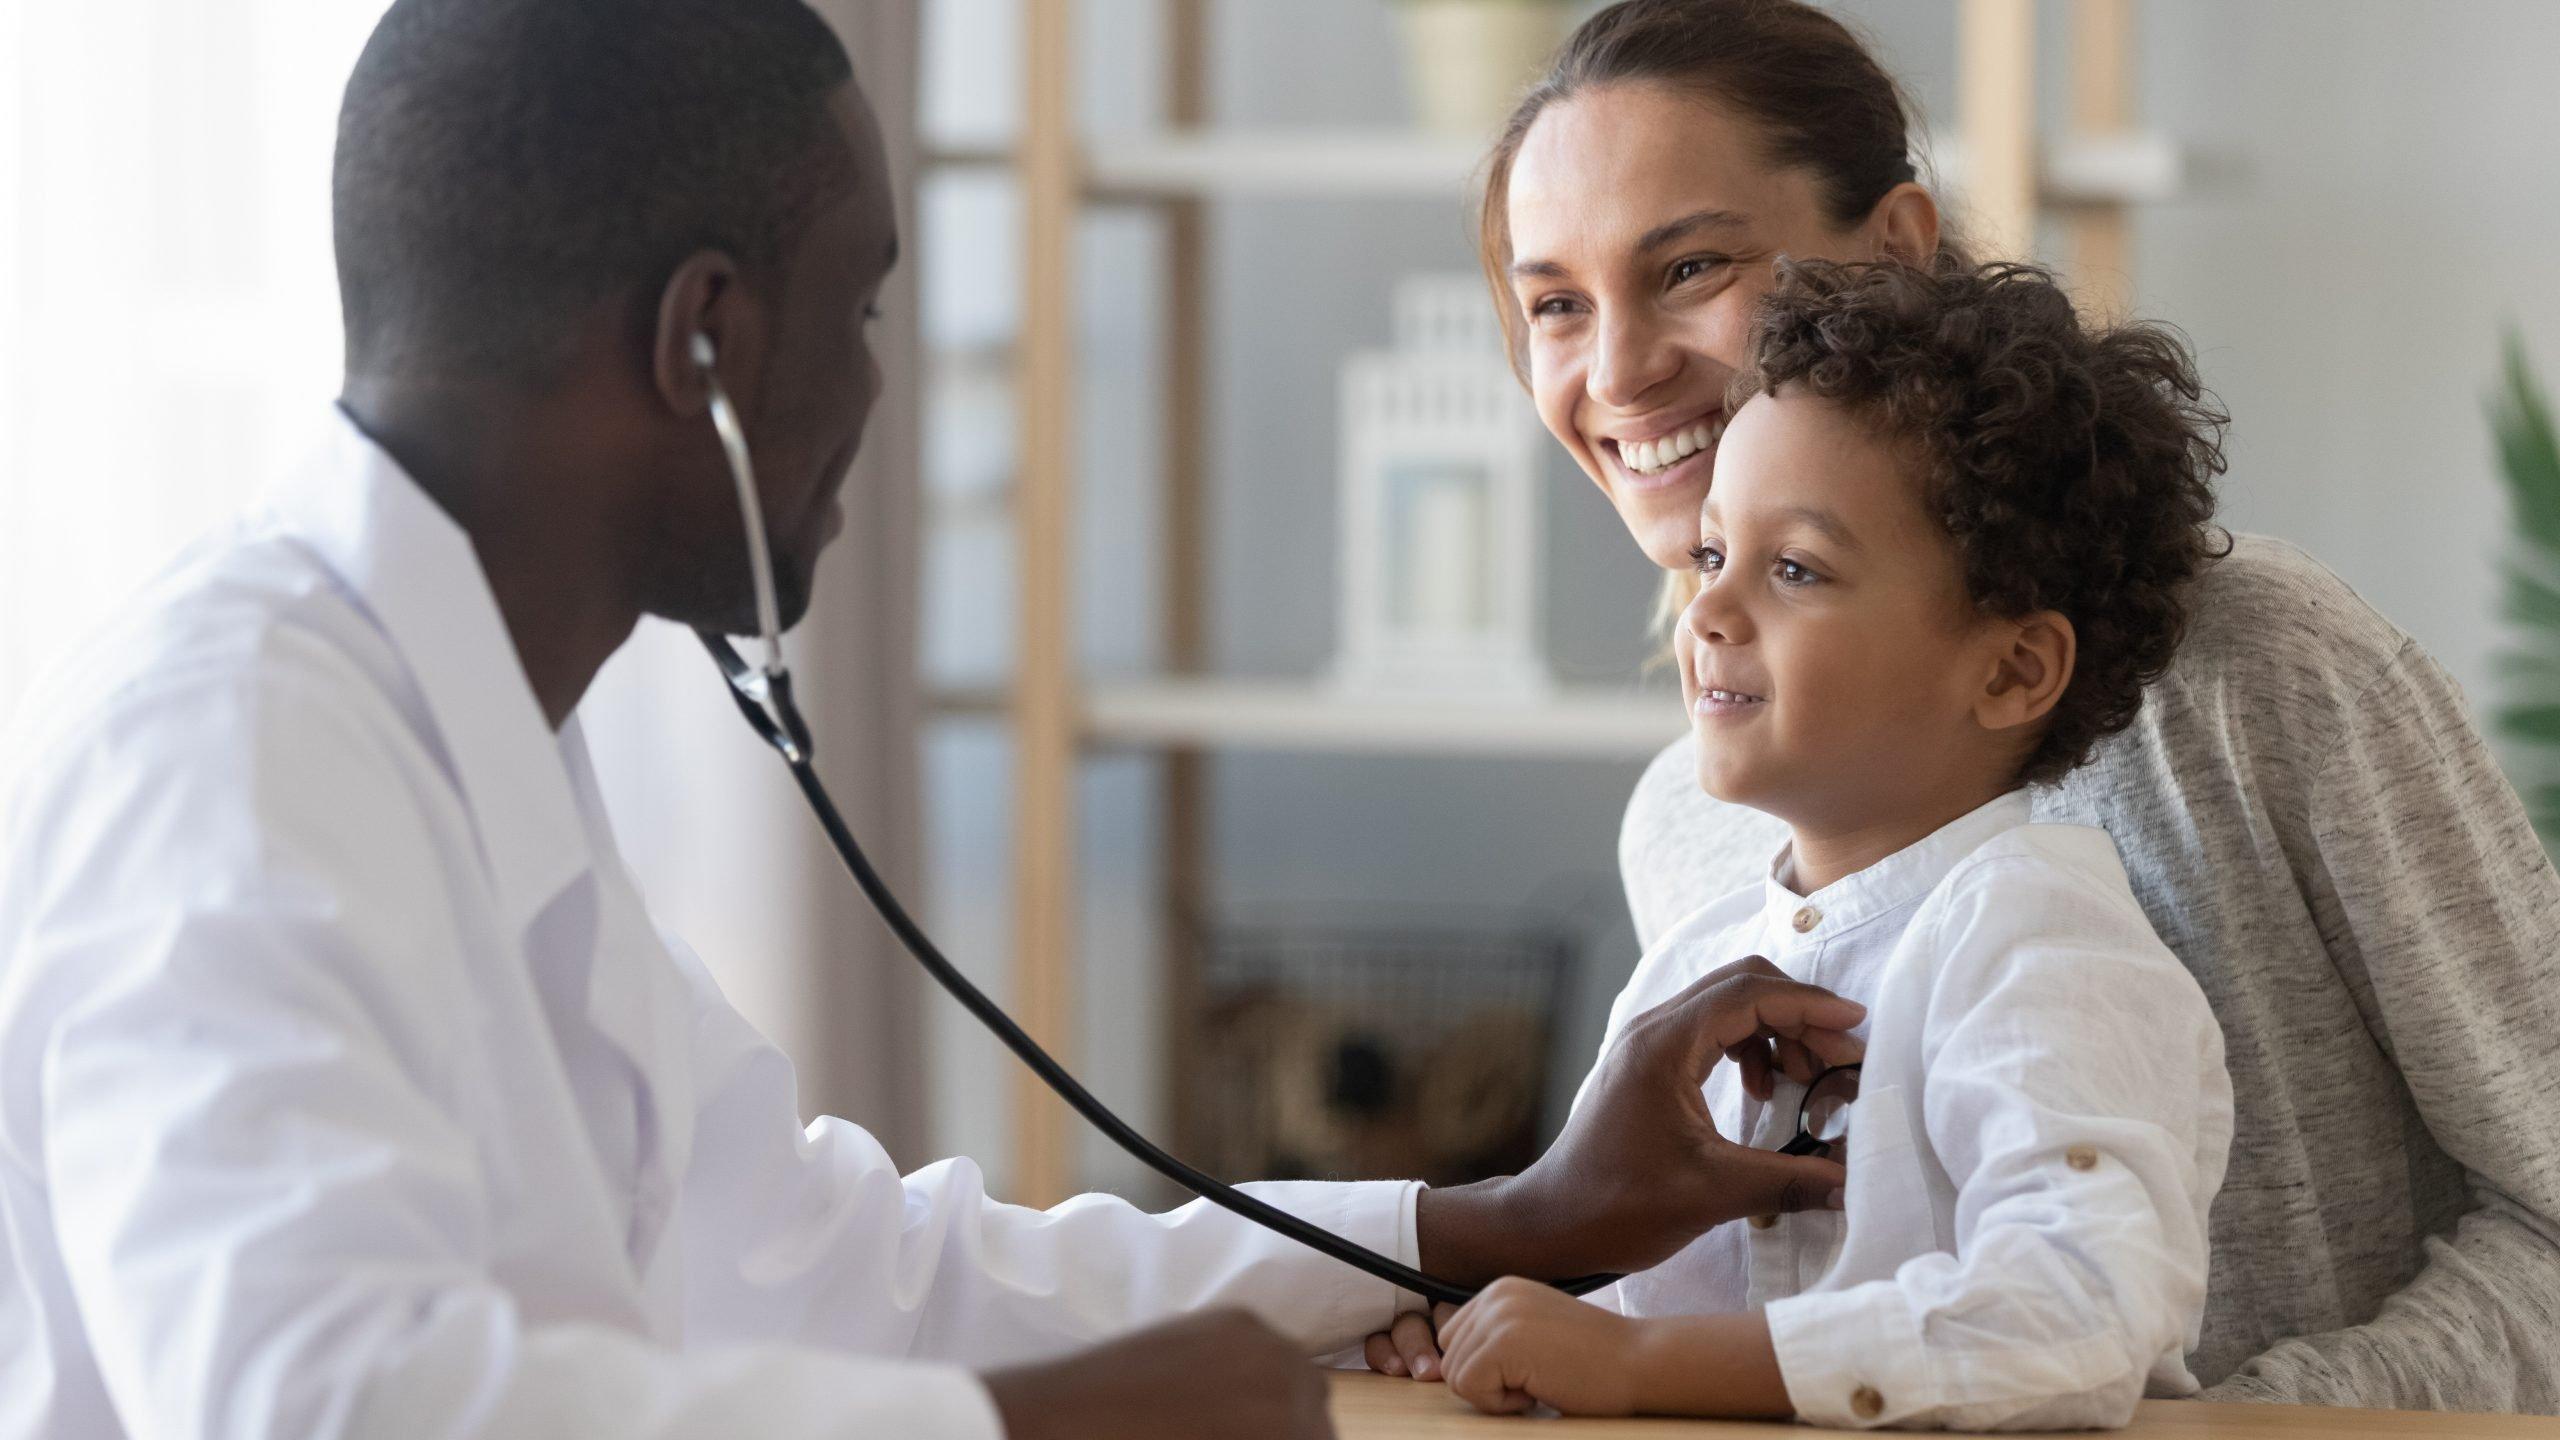 Doctors home image